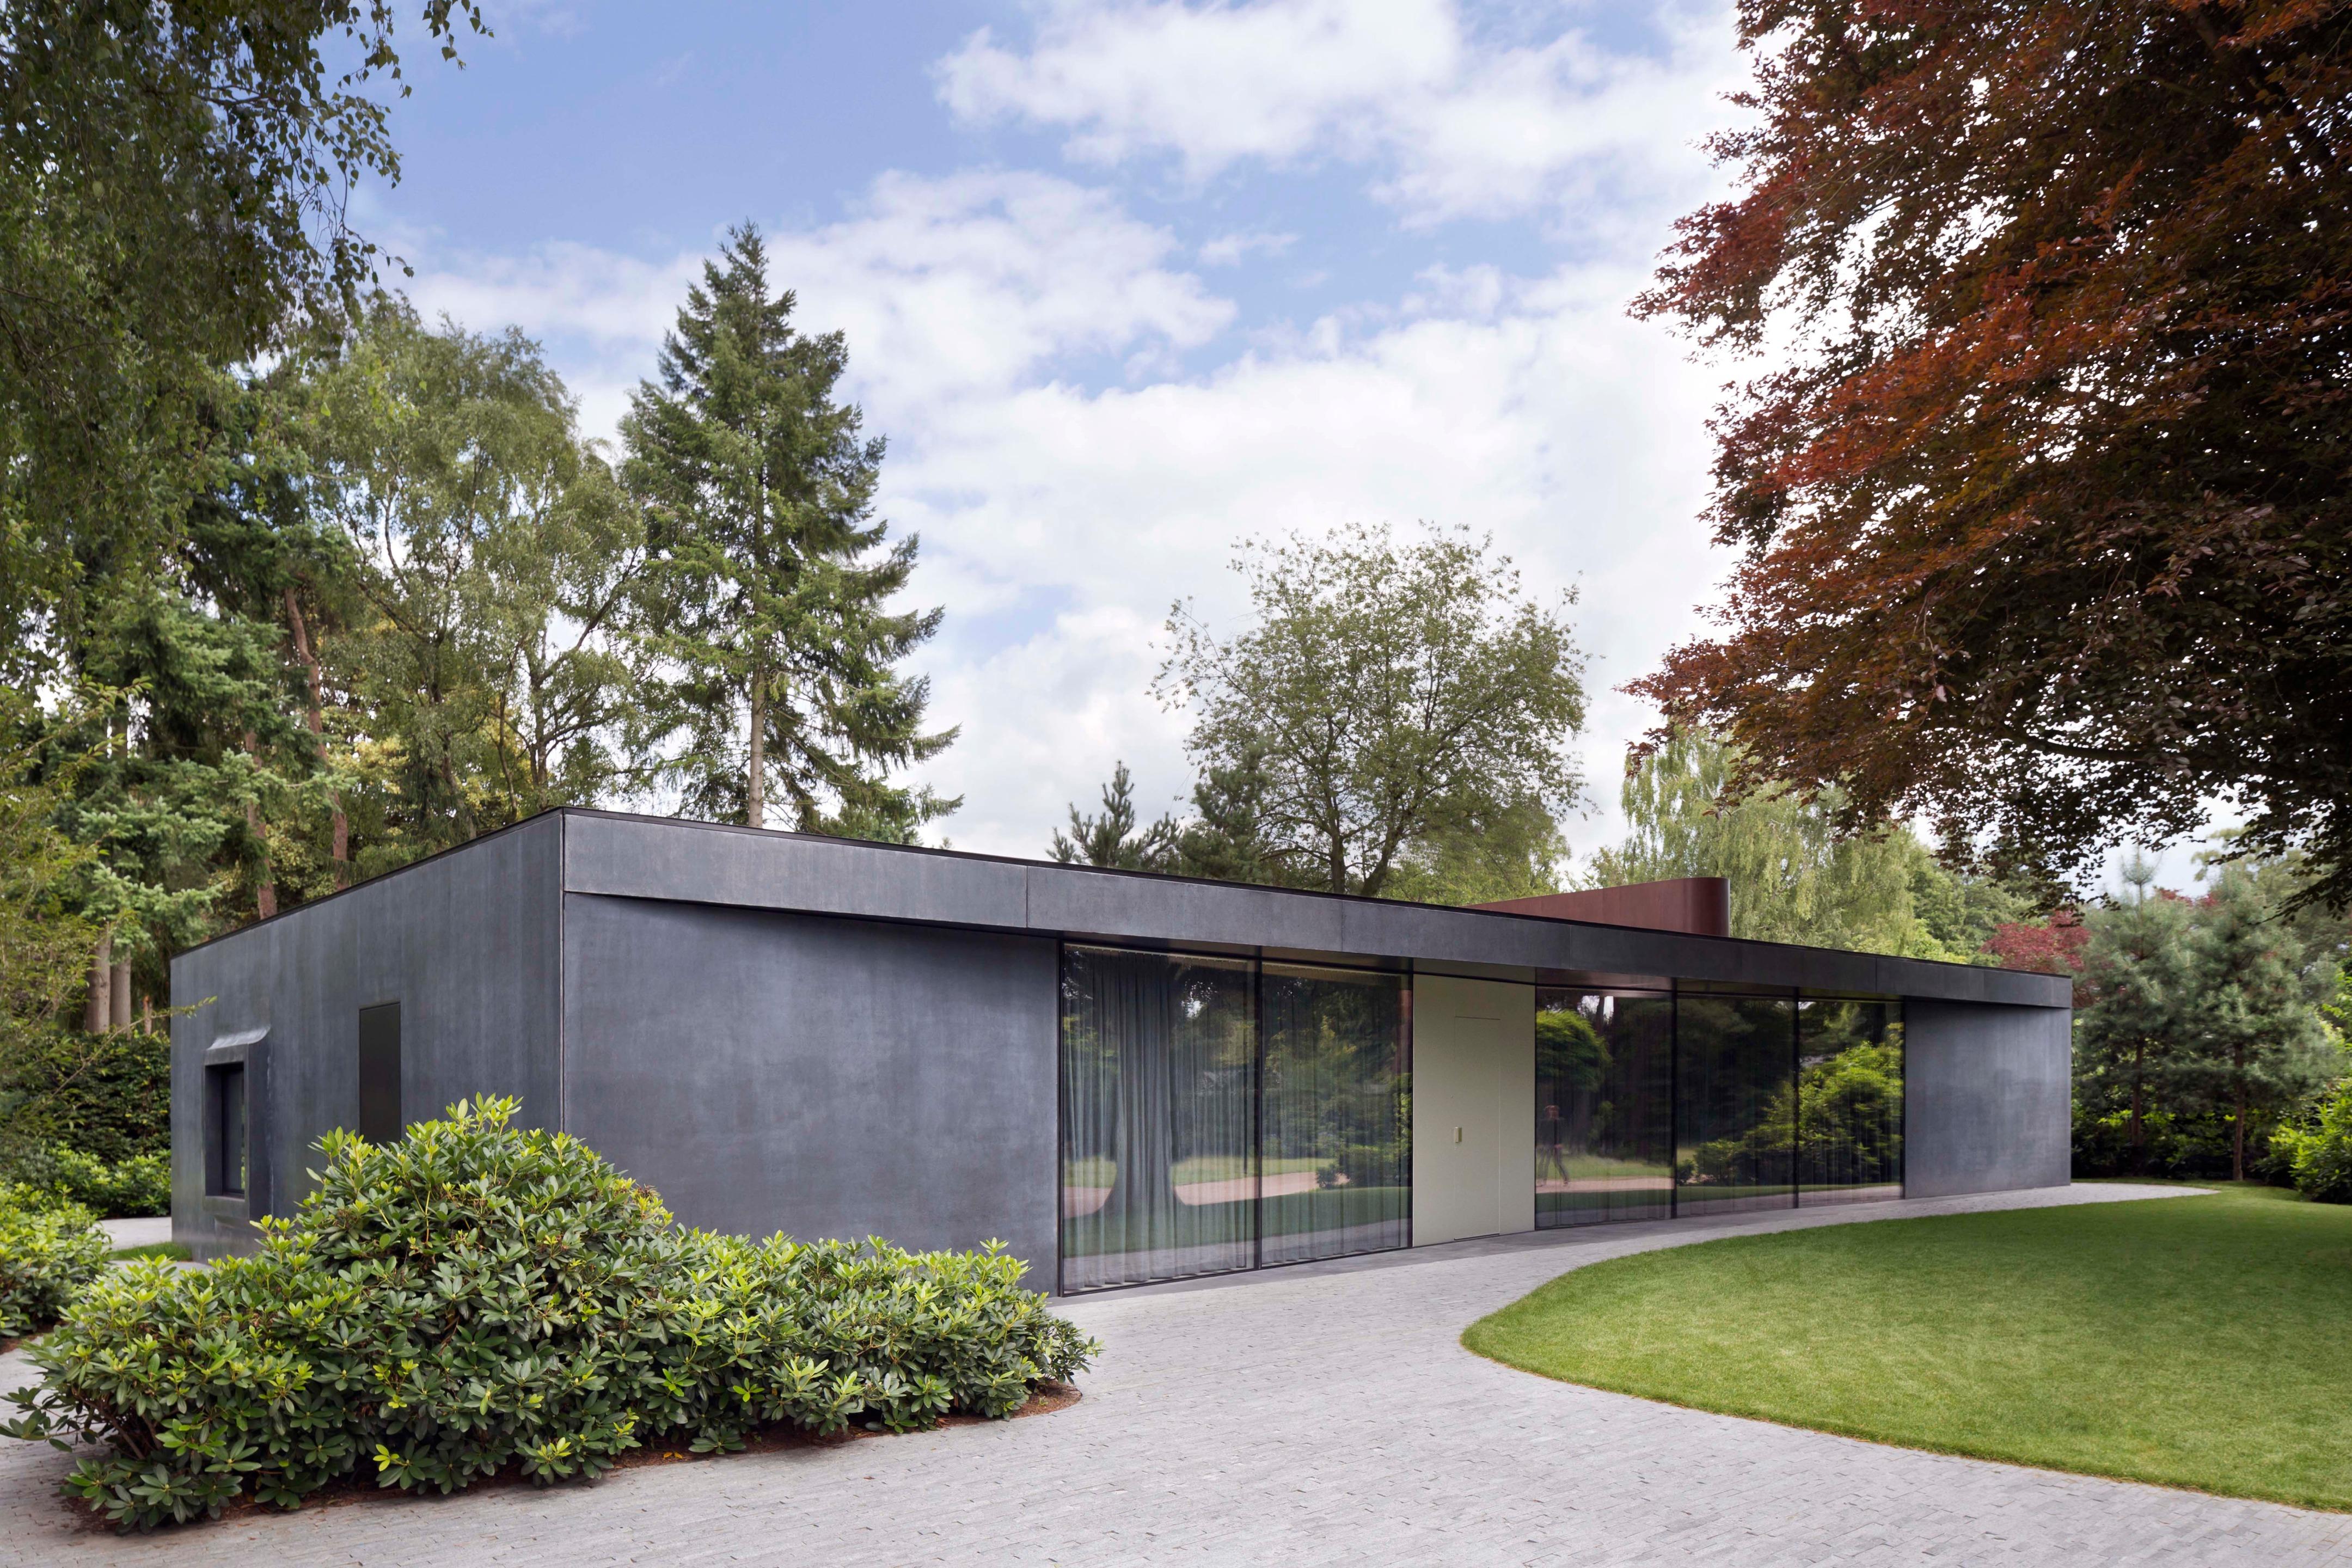 Villa X In Klein Brabant Netherlands By Barcode Architects